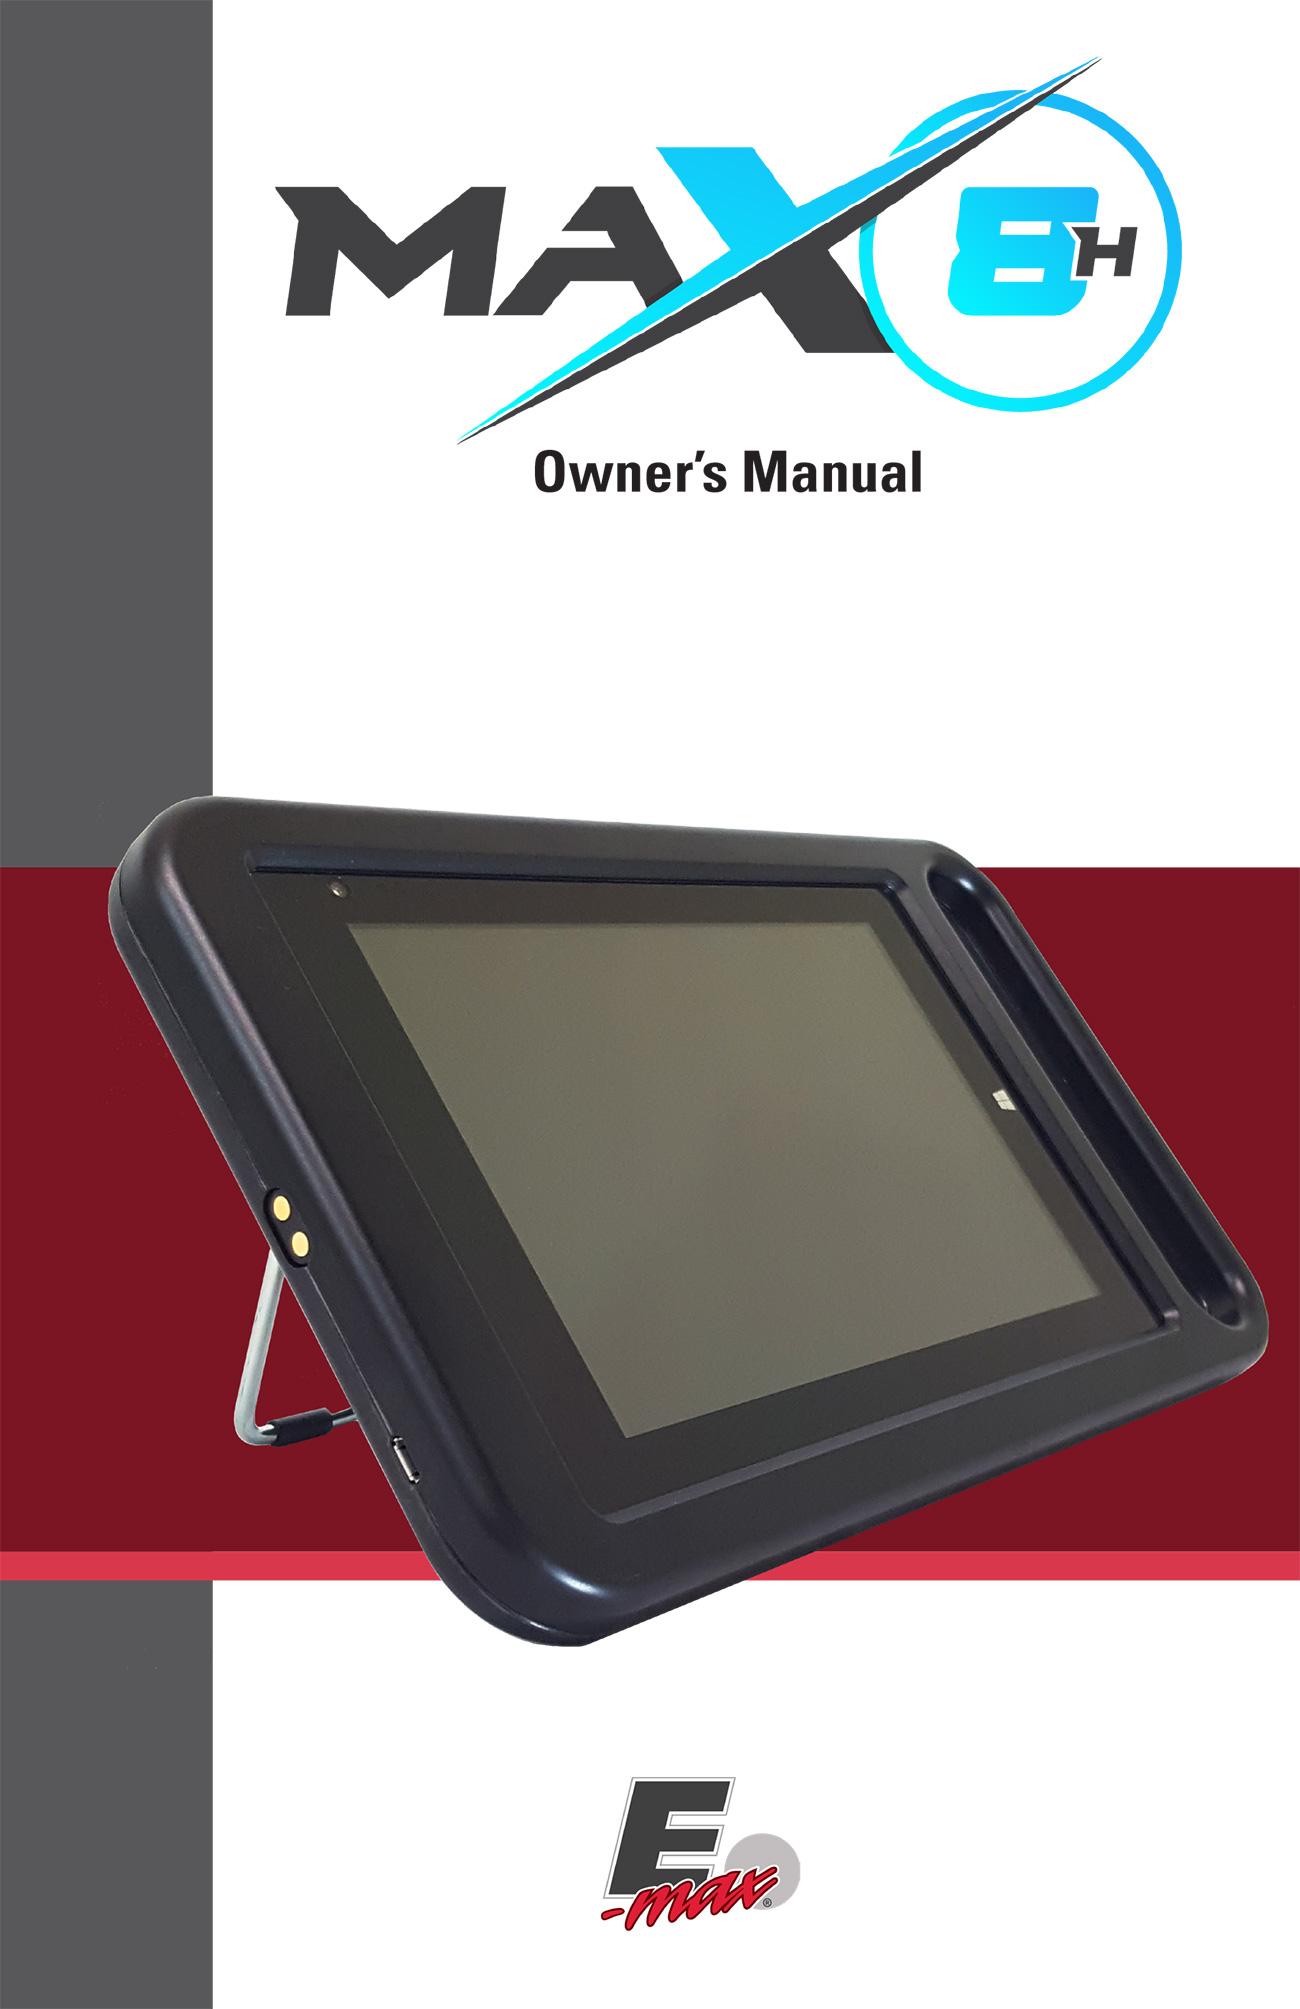 Max 8H Promotional Materials/Equipment Flyers & Brochures